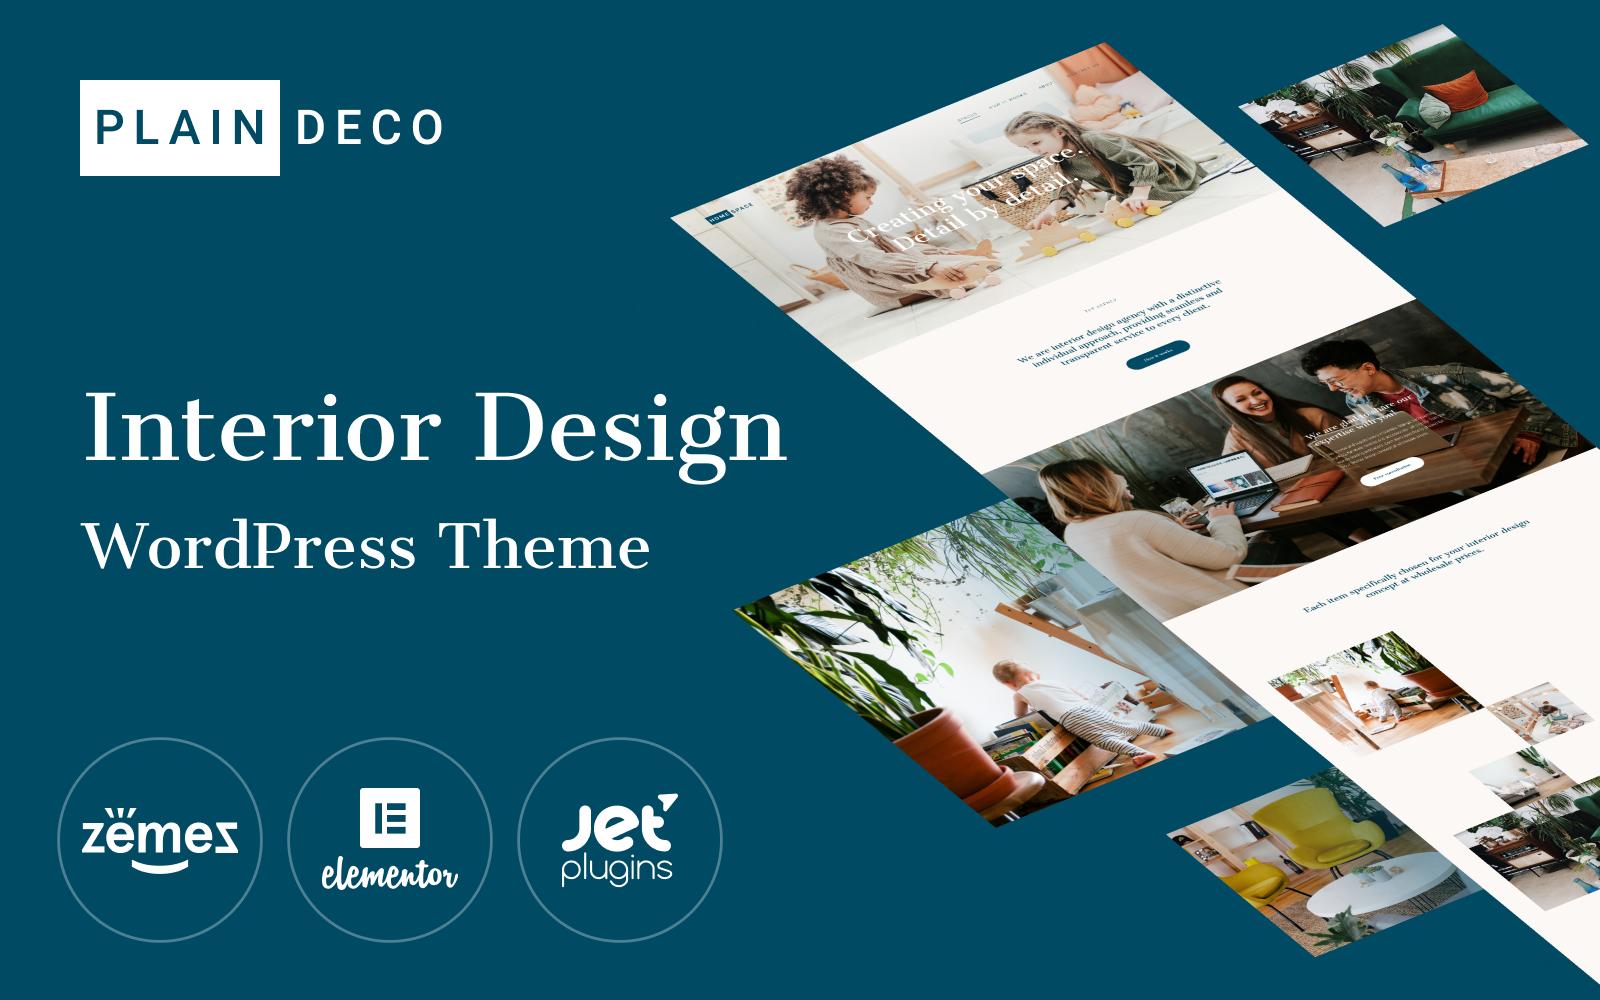 PlainDeco - Interior Design WordPress Theme